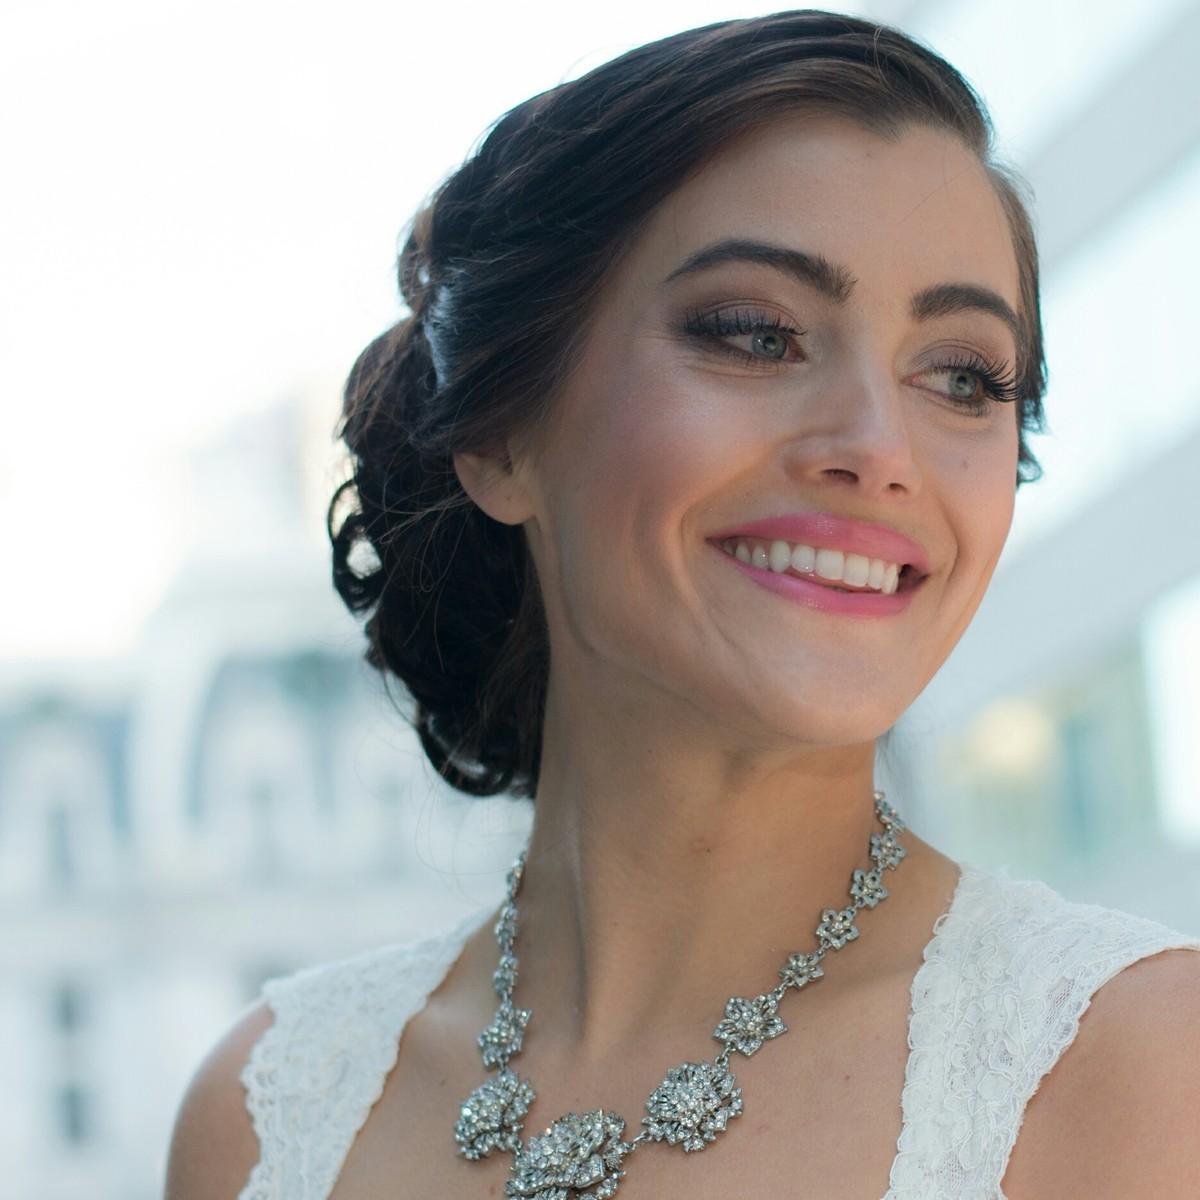 west chester wedding hair & makeup - reviews for hair & makeup